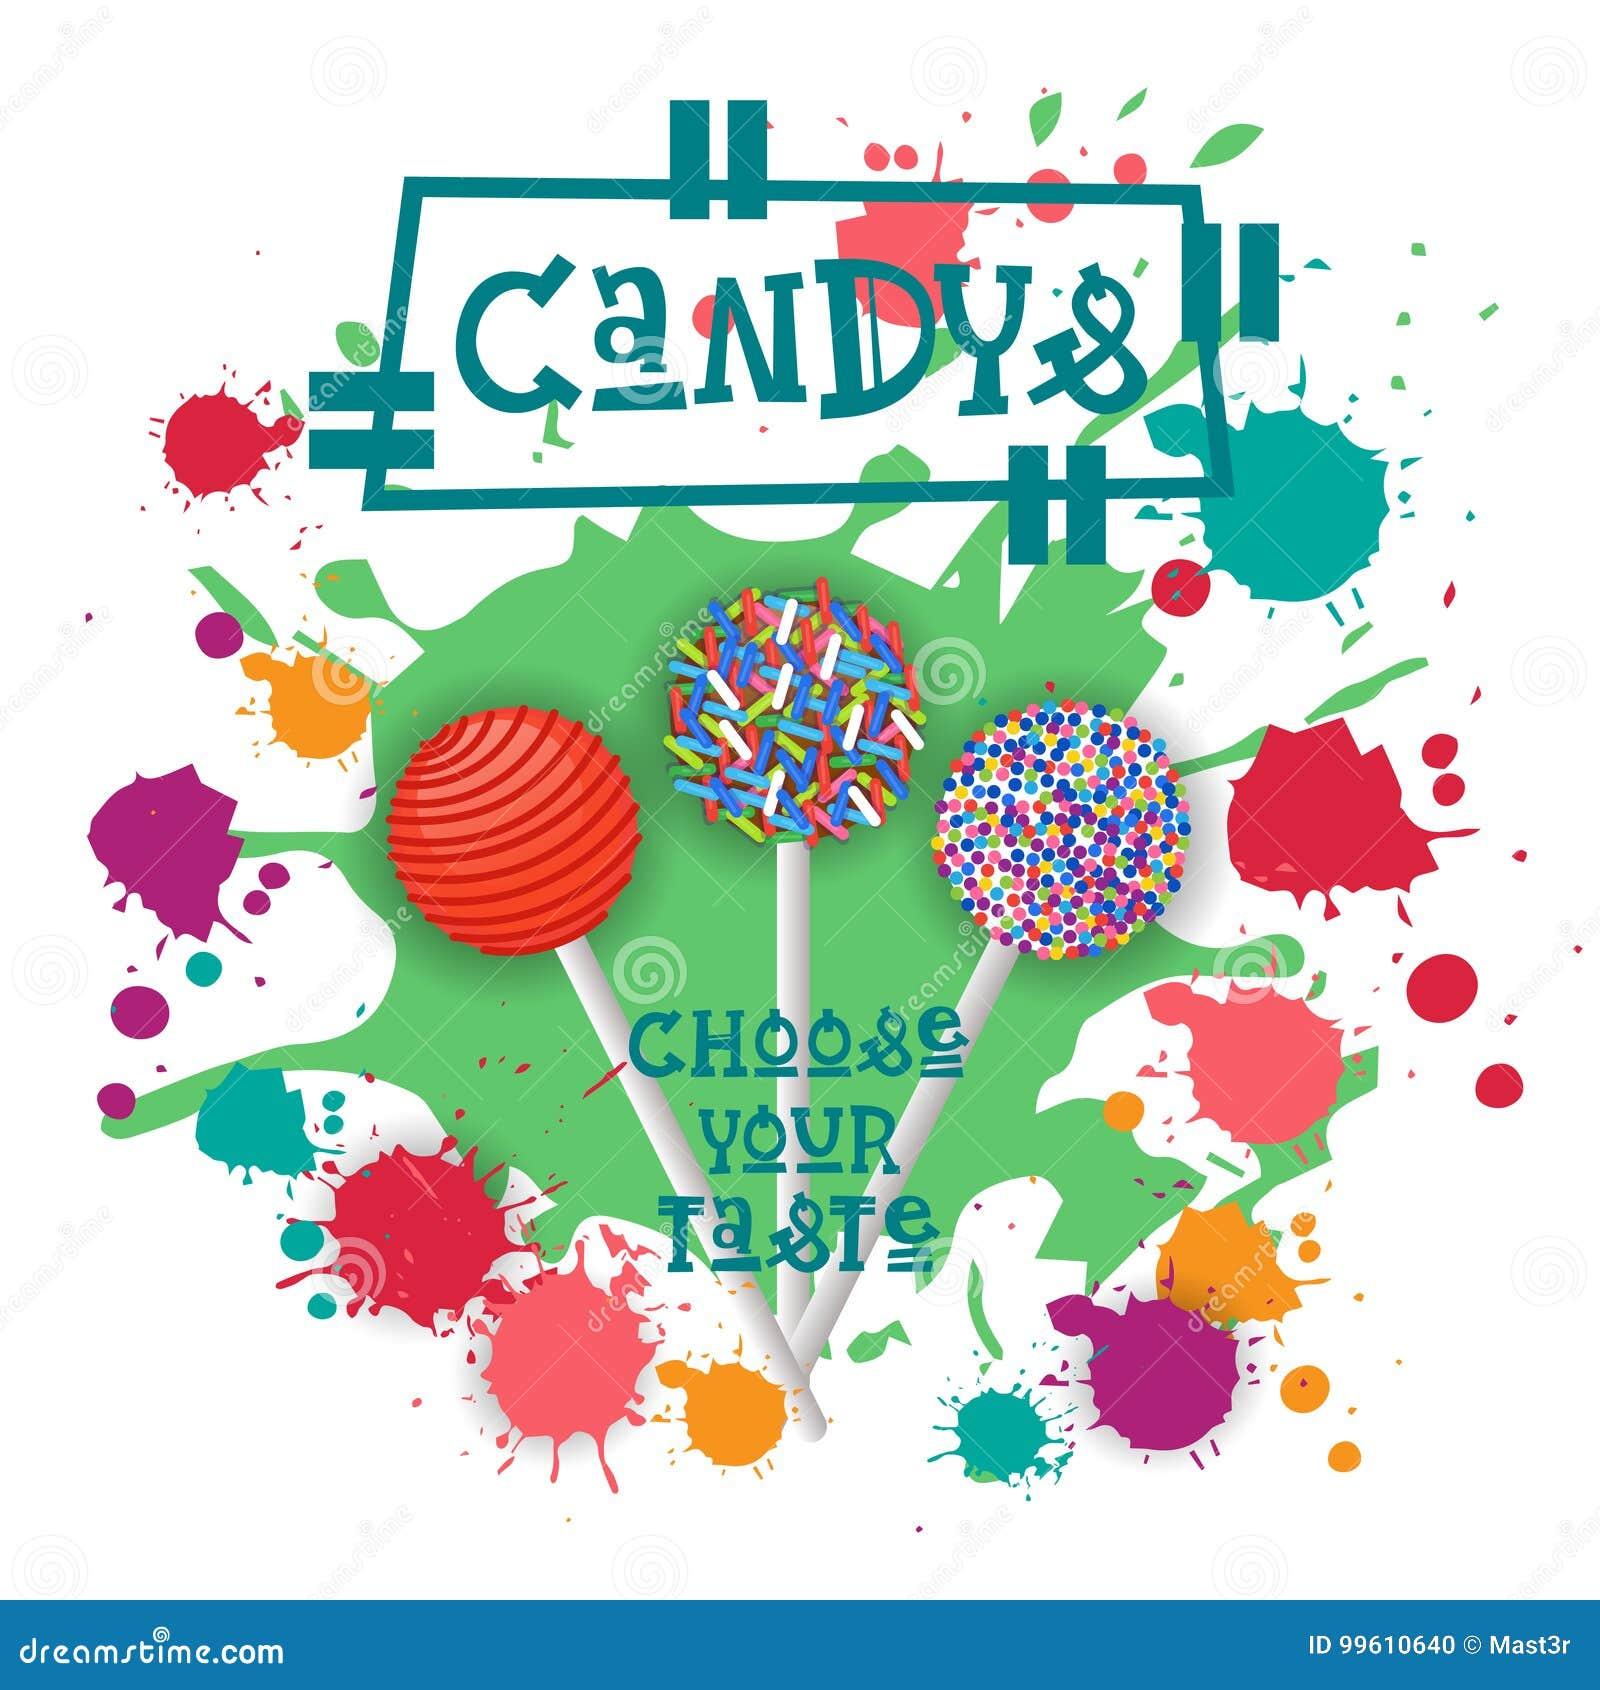 Candys Lolly Dessert Colorful Icon Choose Ihr Geschmack-Café-Plakat